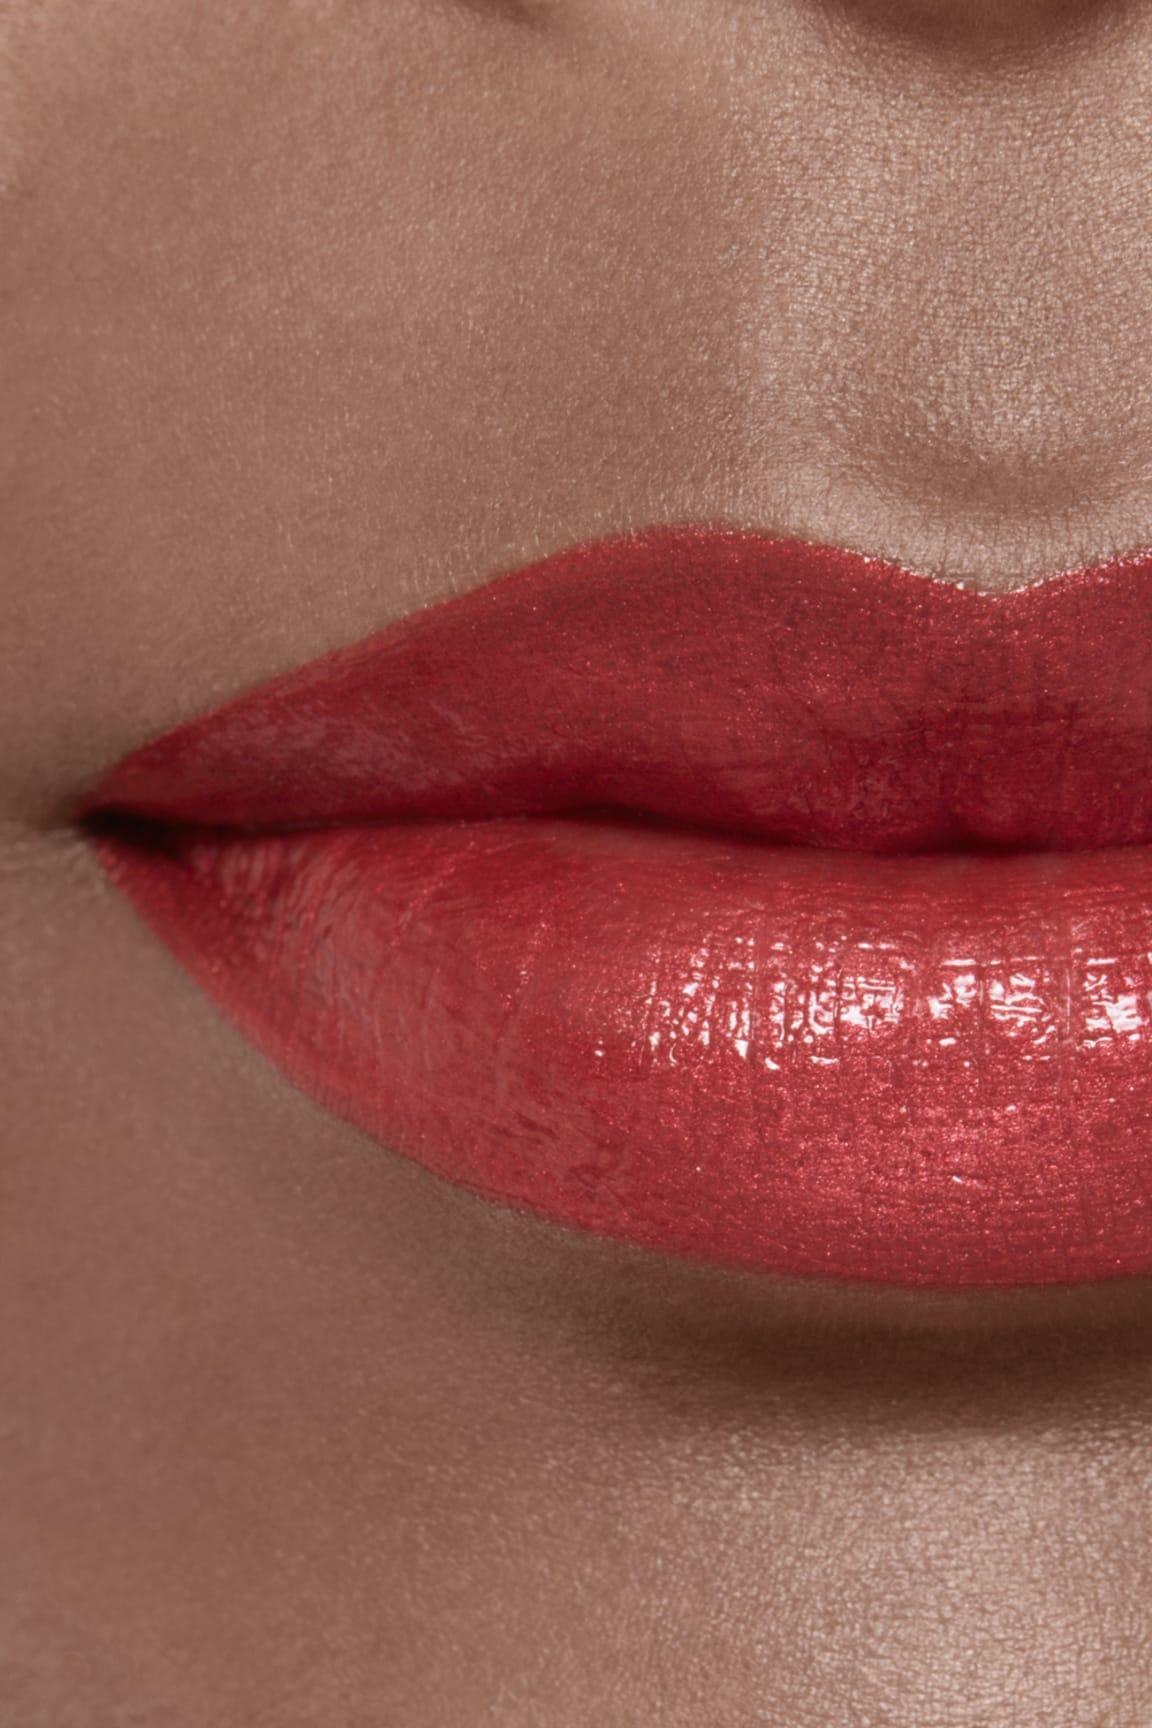 Visuel d'application maquillage 2 - ROUGE ALLURE LAQUE 71 - MYTHE